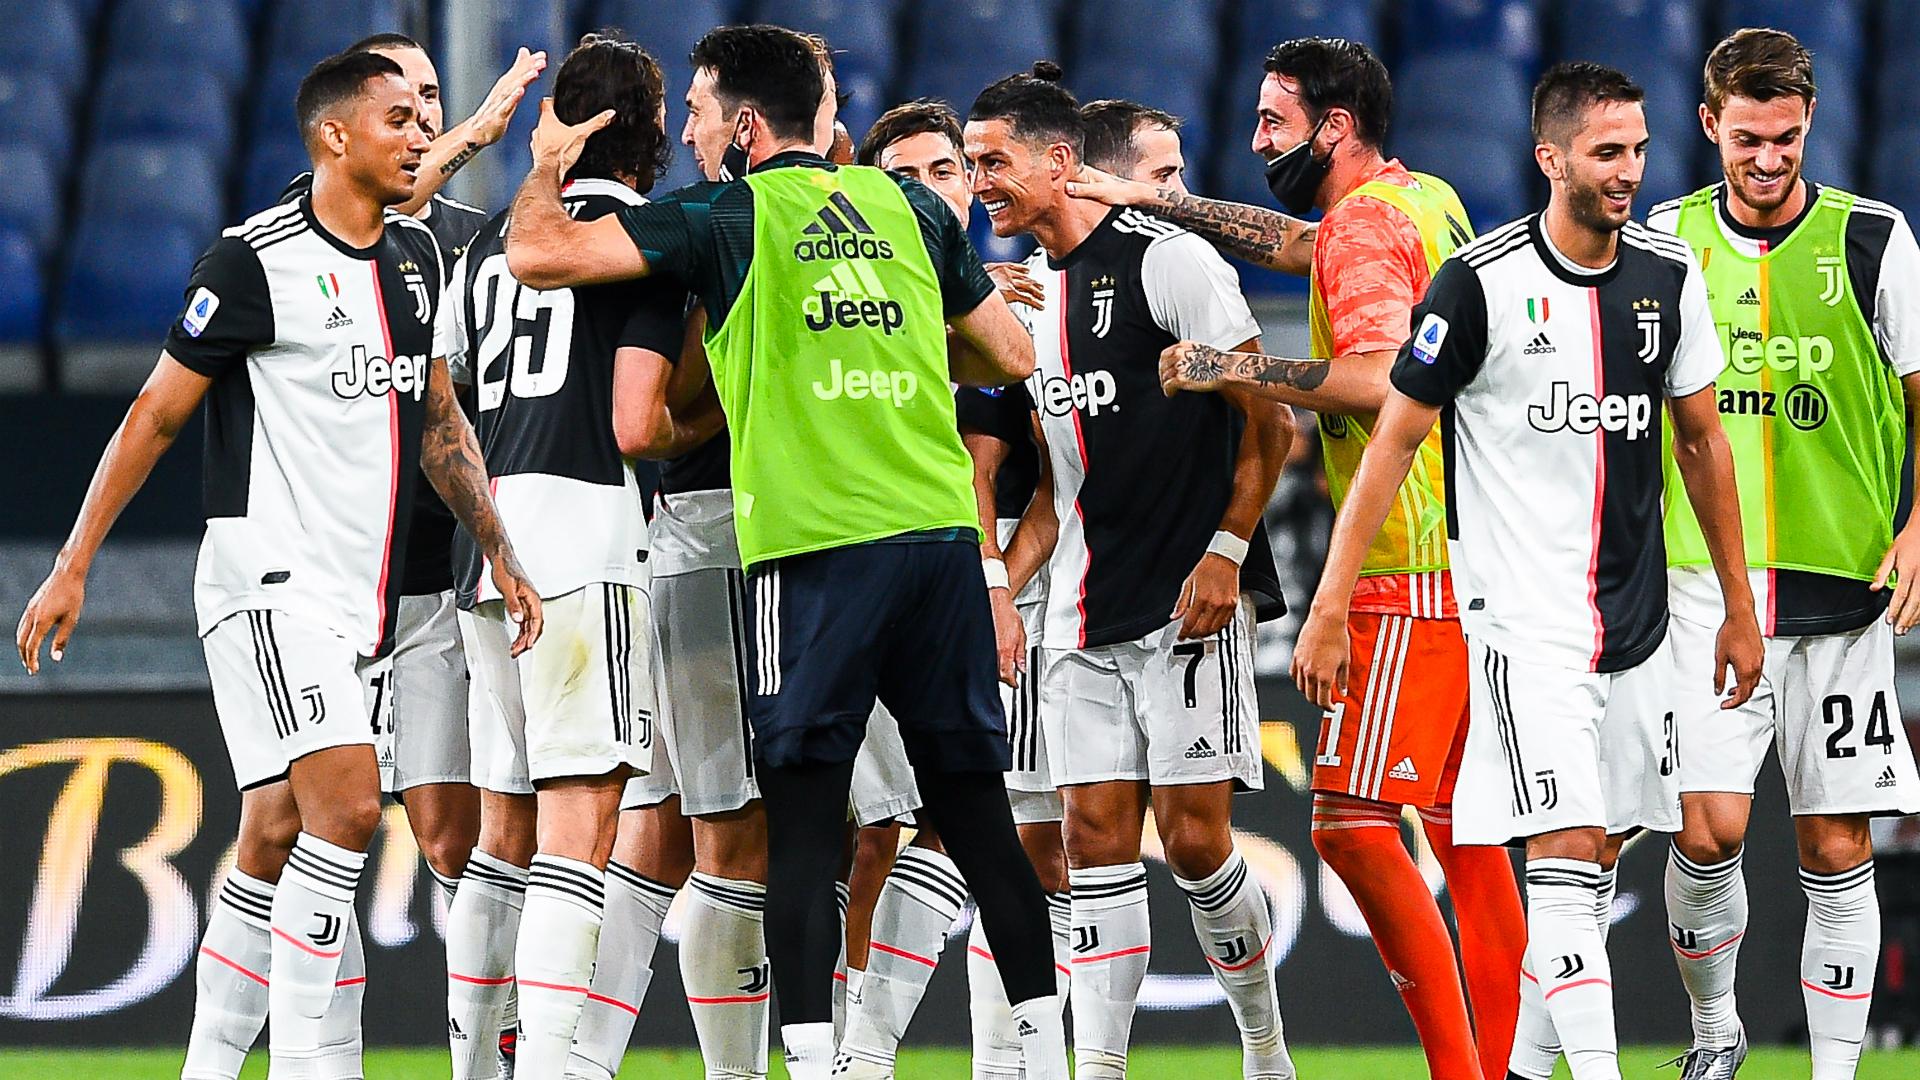 Sarri: Juventus won thanks to phenomenal skills from Ronaldo, Dybala and Costa